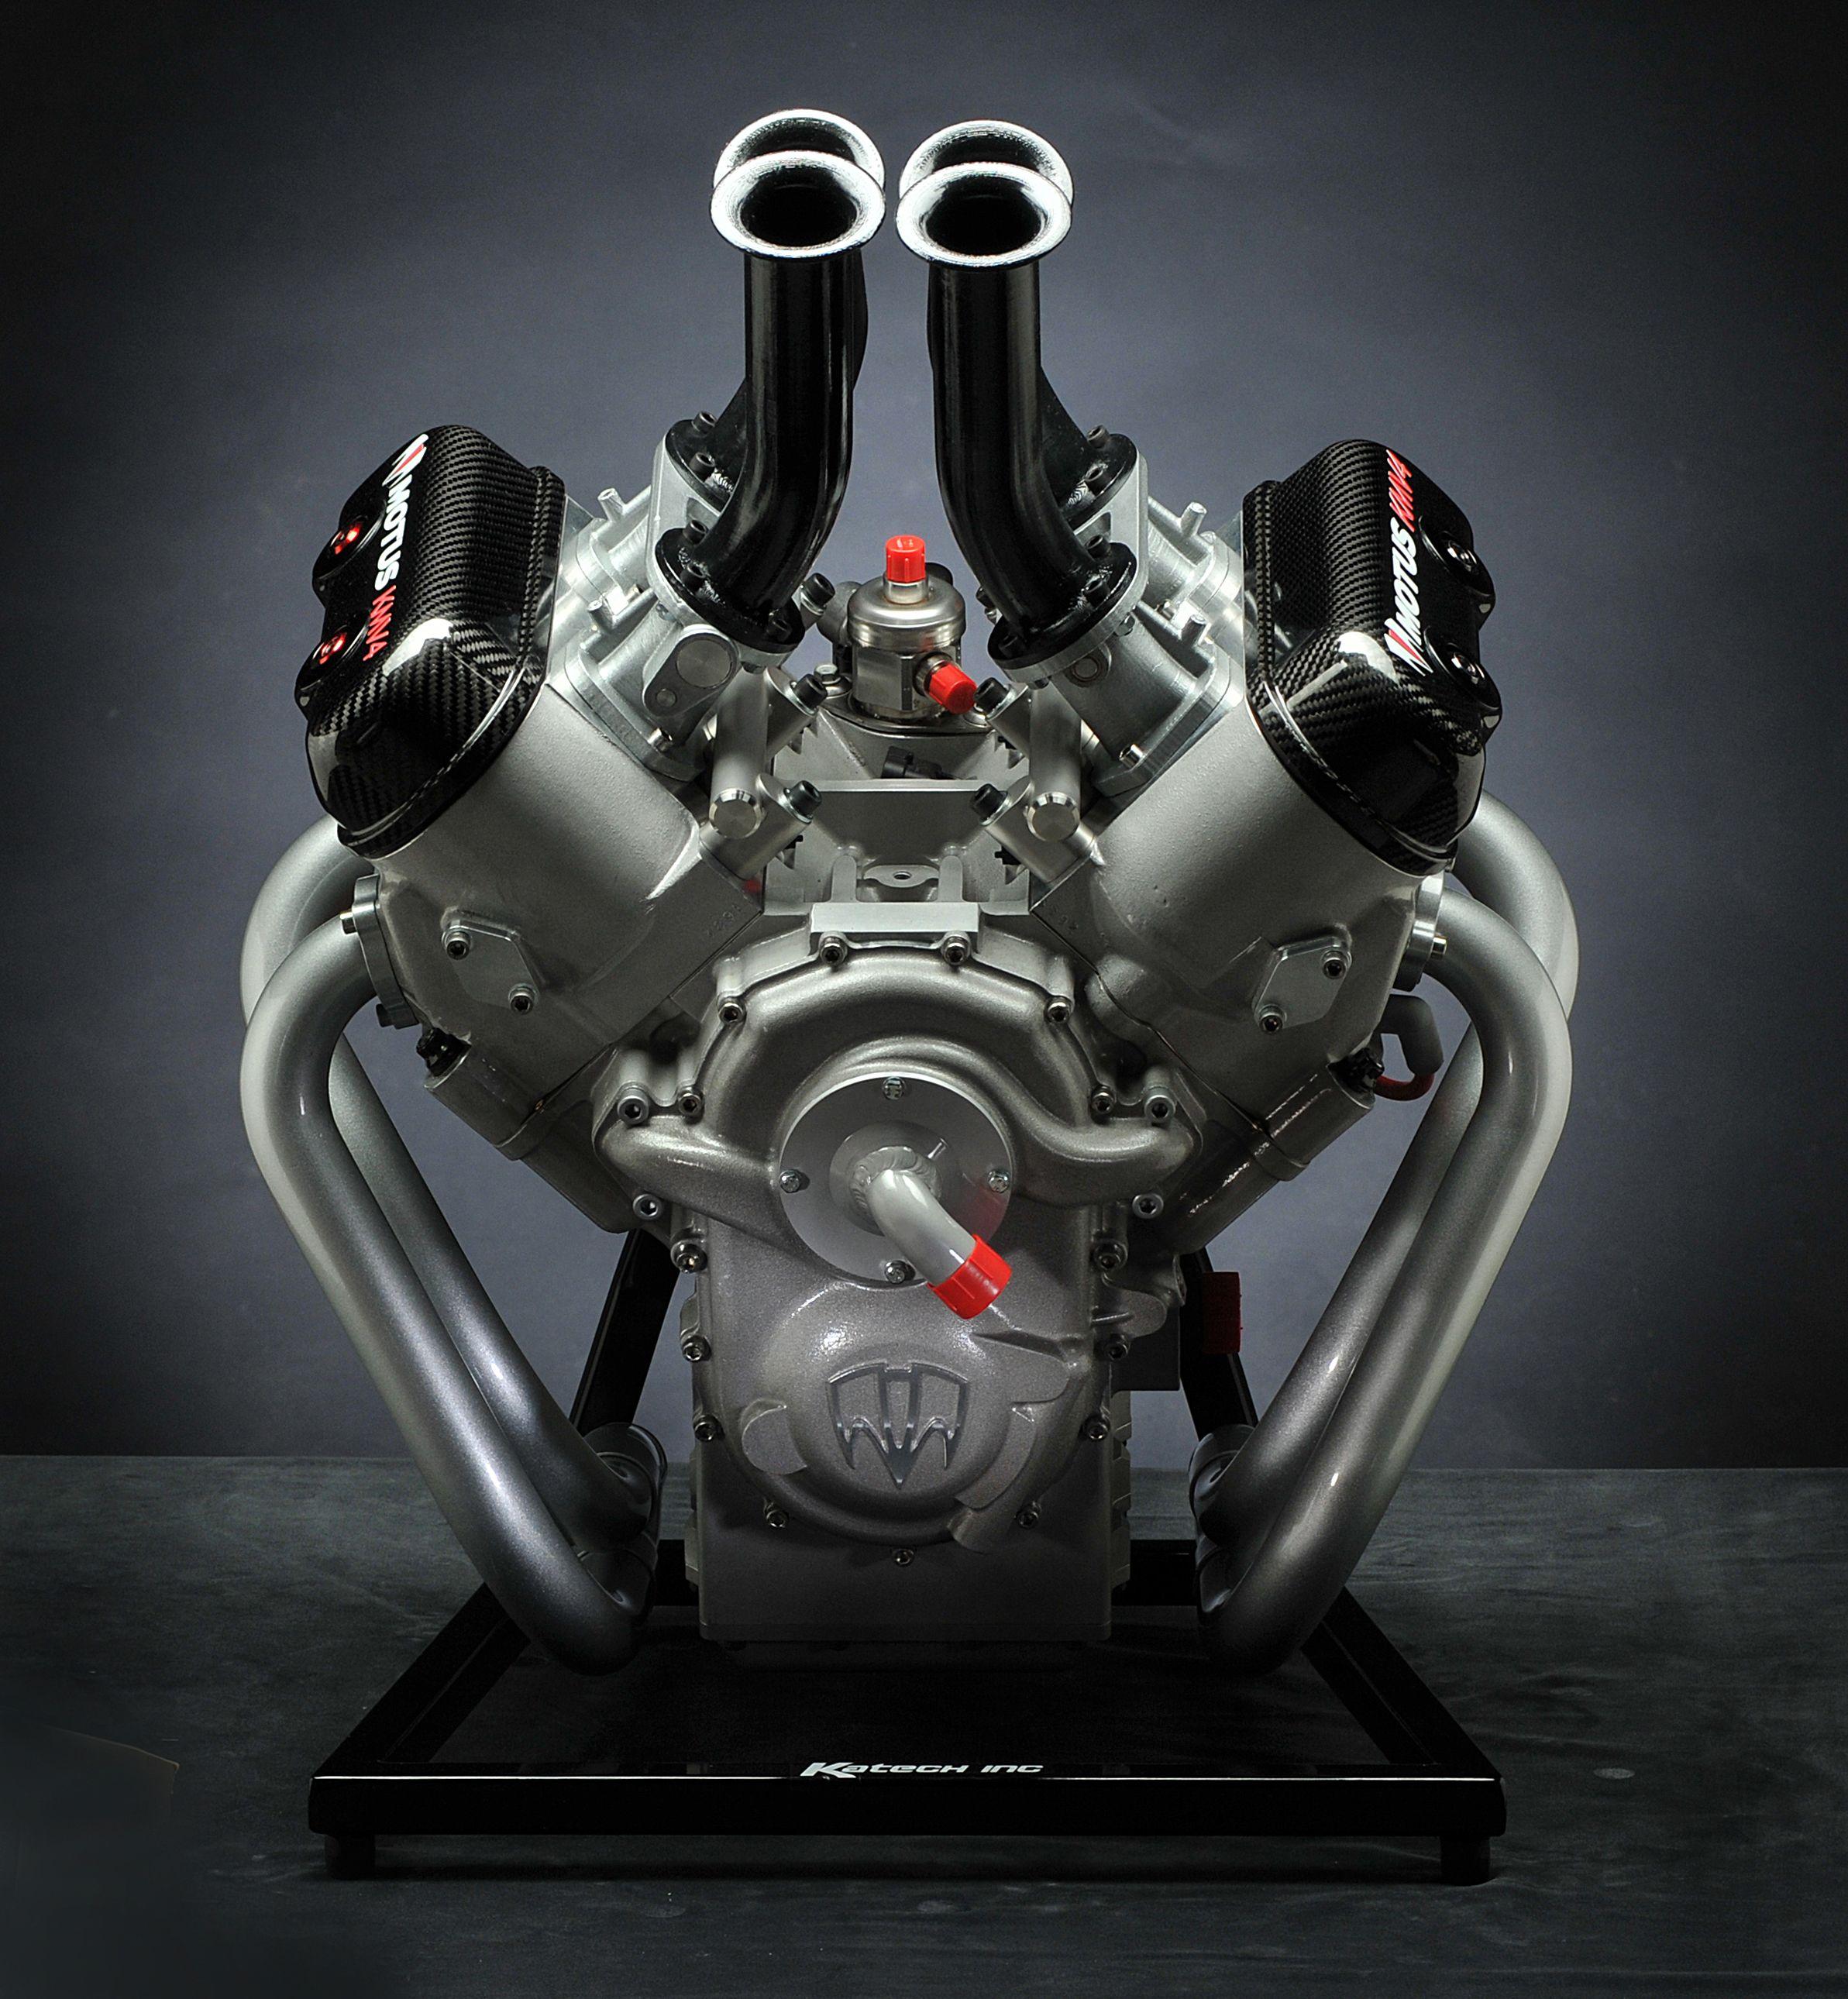 Motus Motorcycle Crate Engine   disrespect1st com